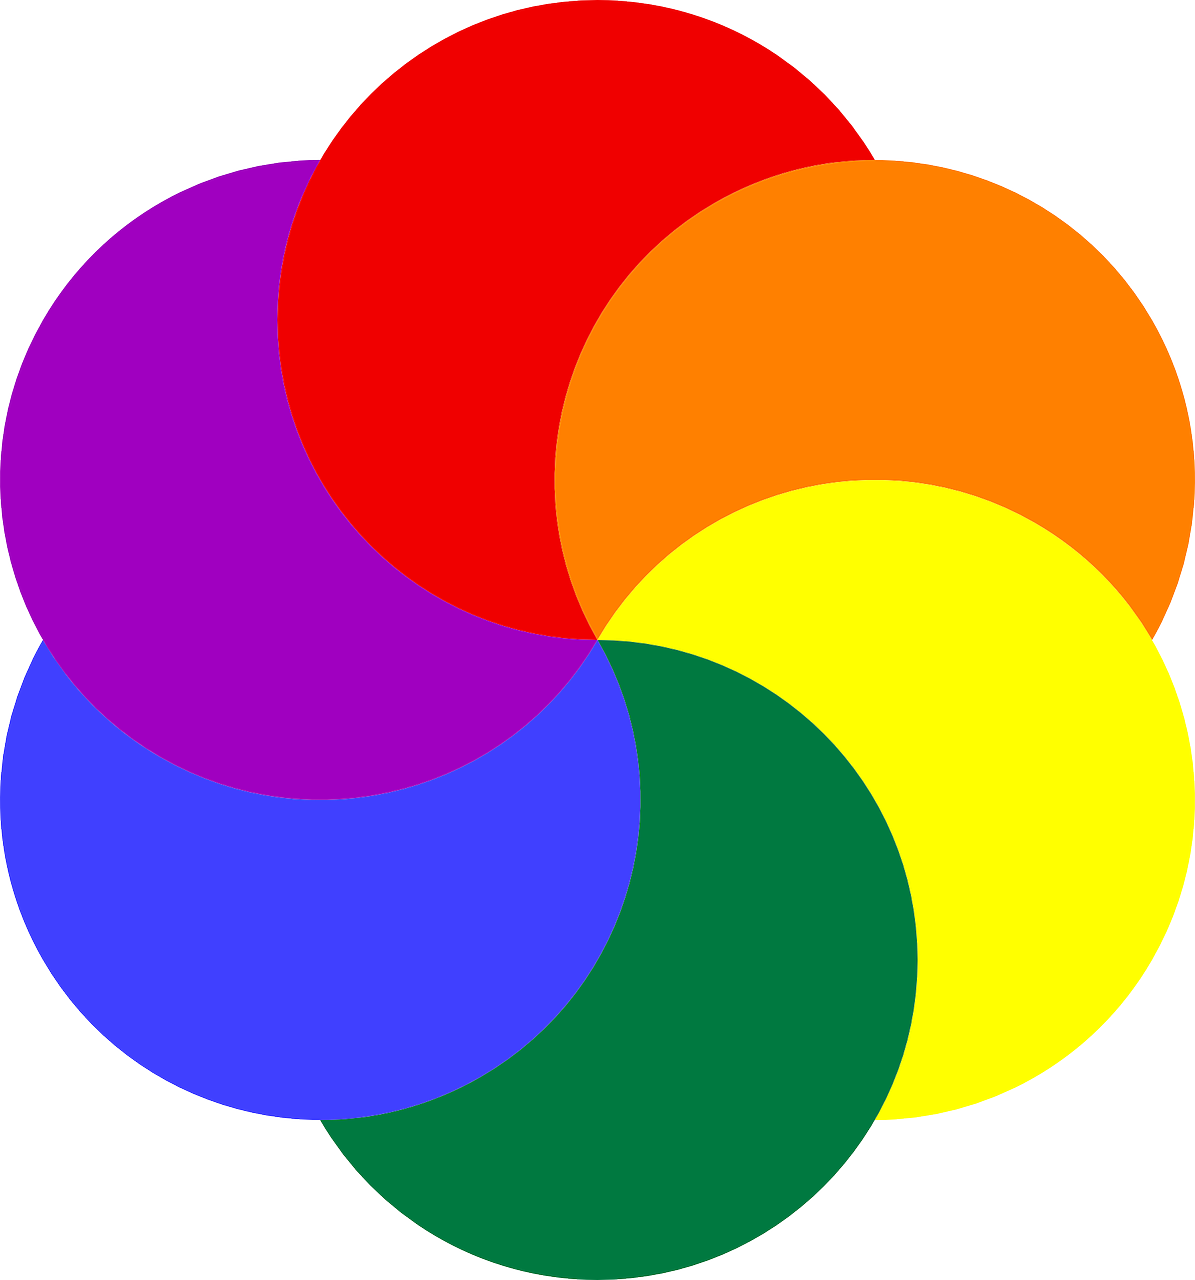 colors, rainbow colors, circle-155896.jpg